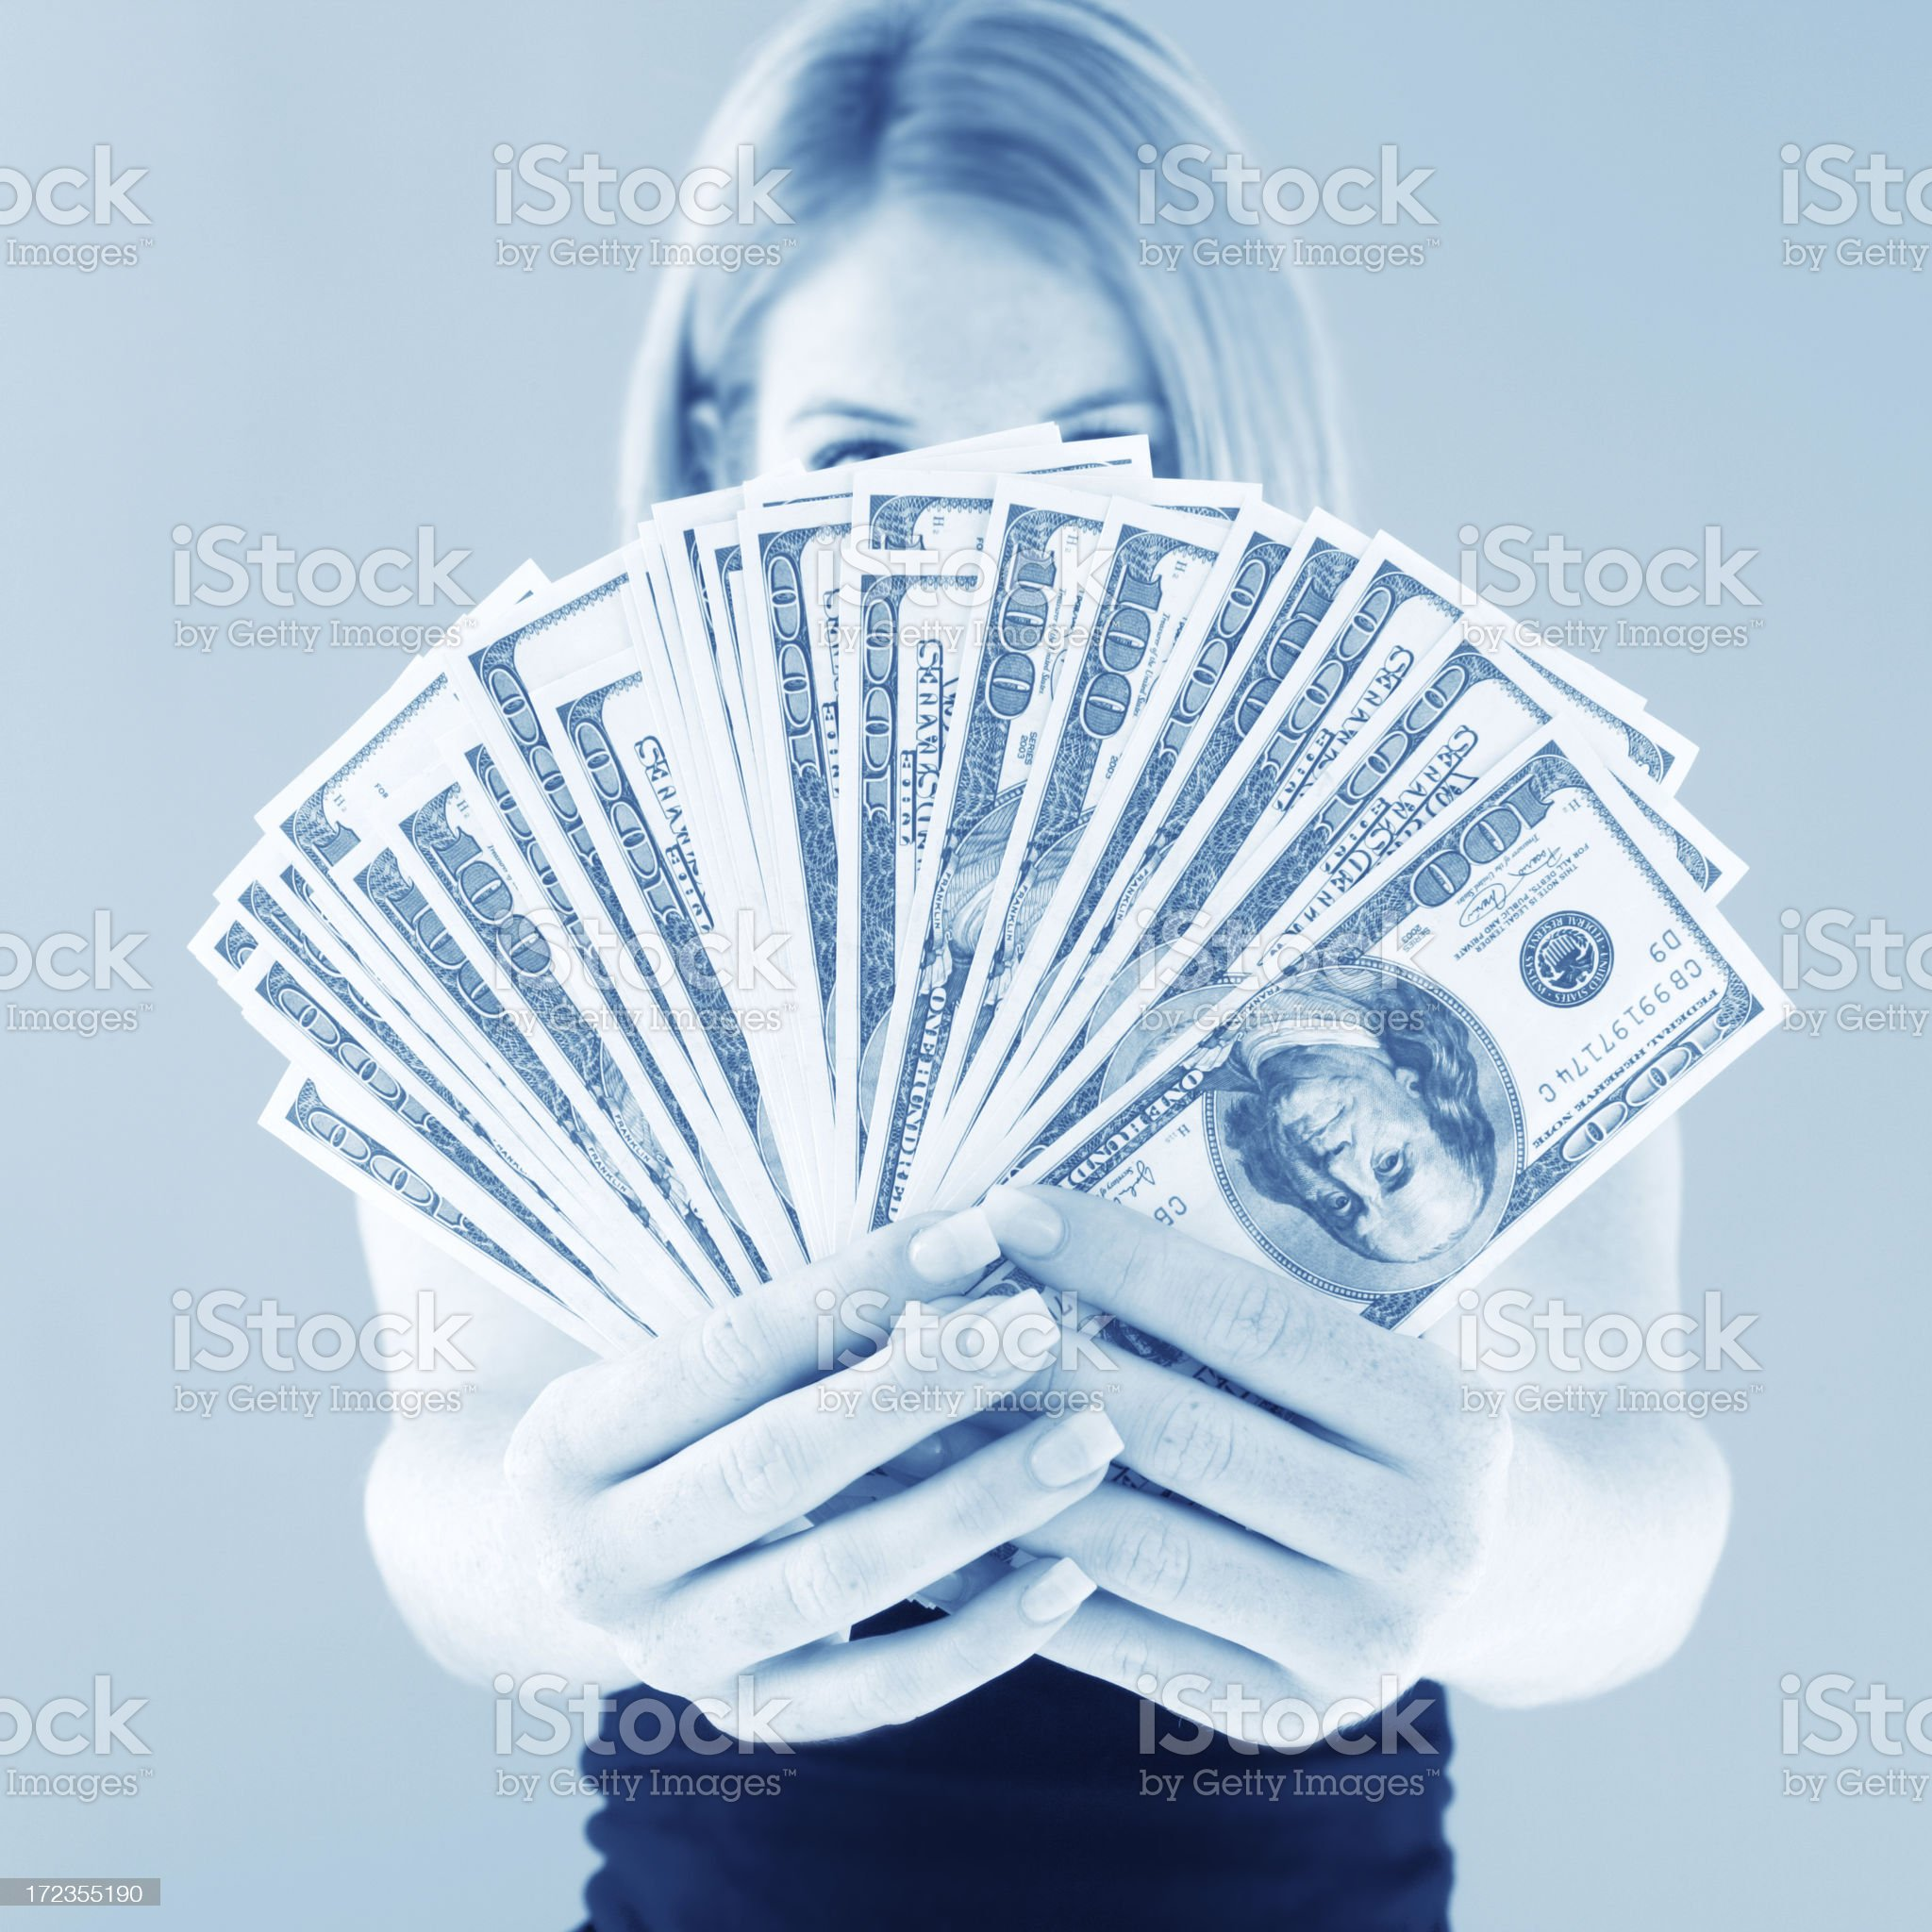 Cold Hard Cash royalty-free stock photo